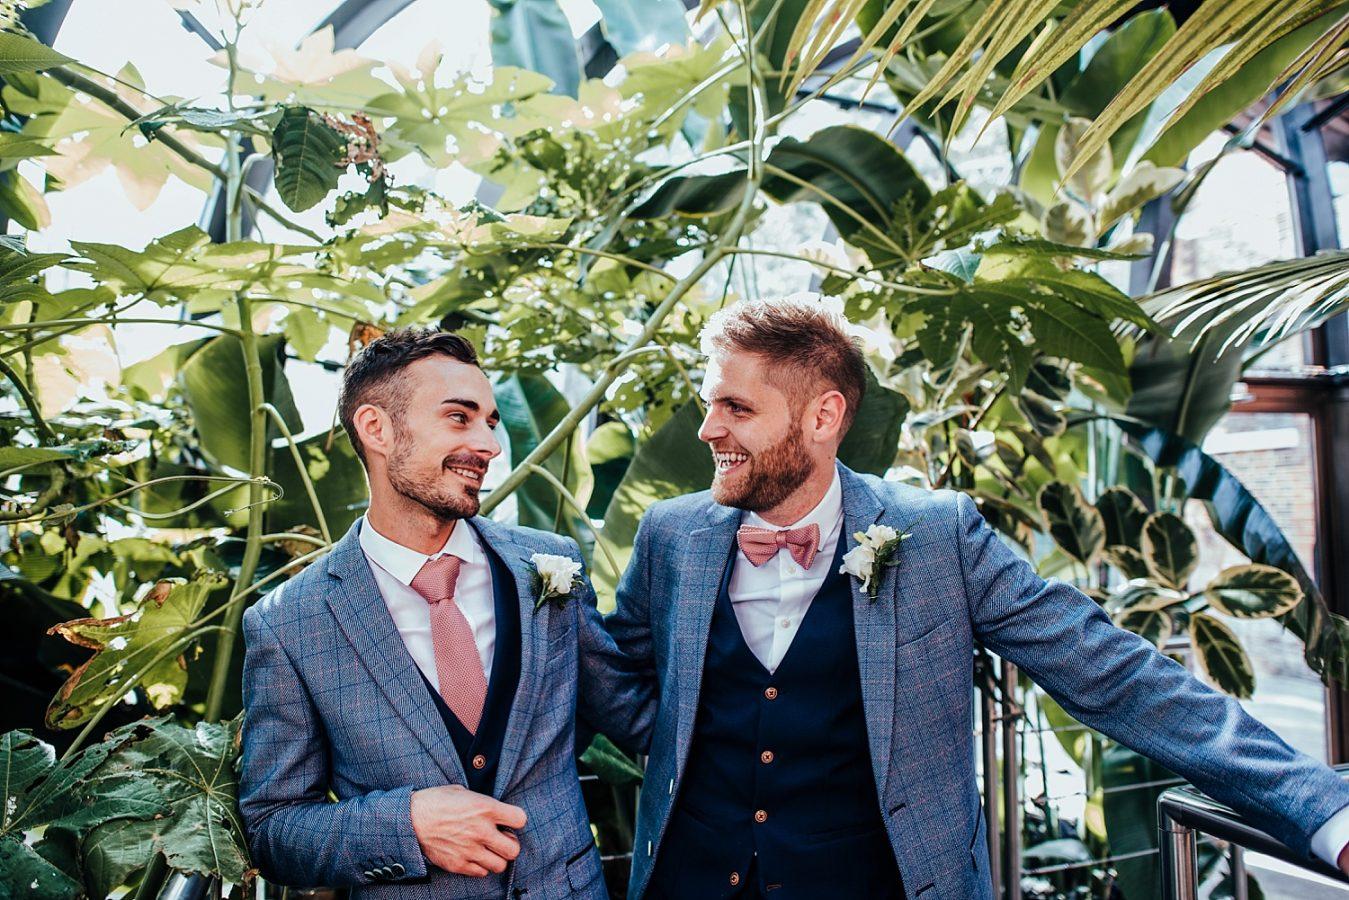 same sex wedding at bombay sapphire distillery wedding laverstoke